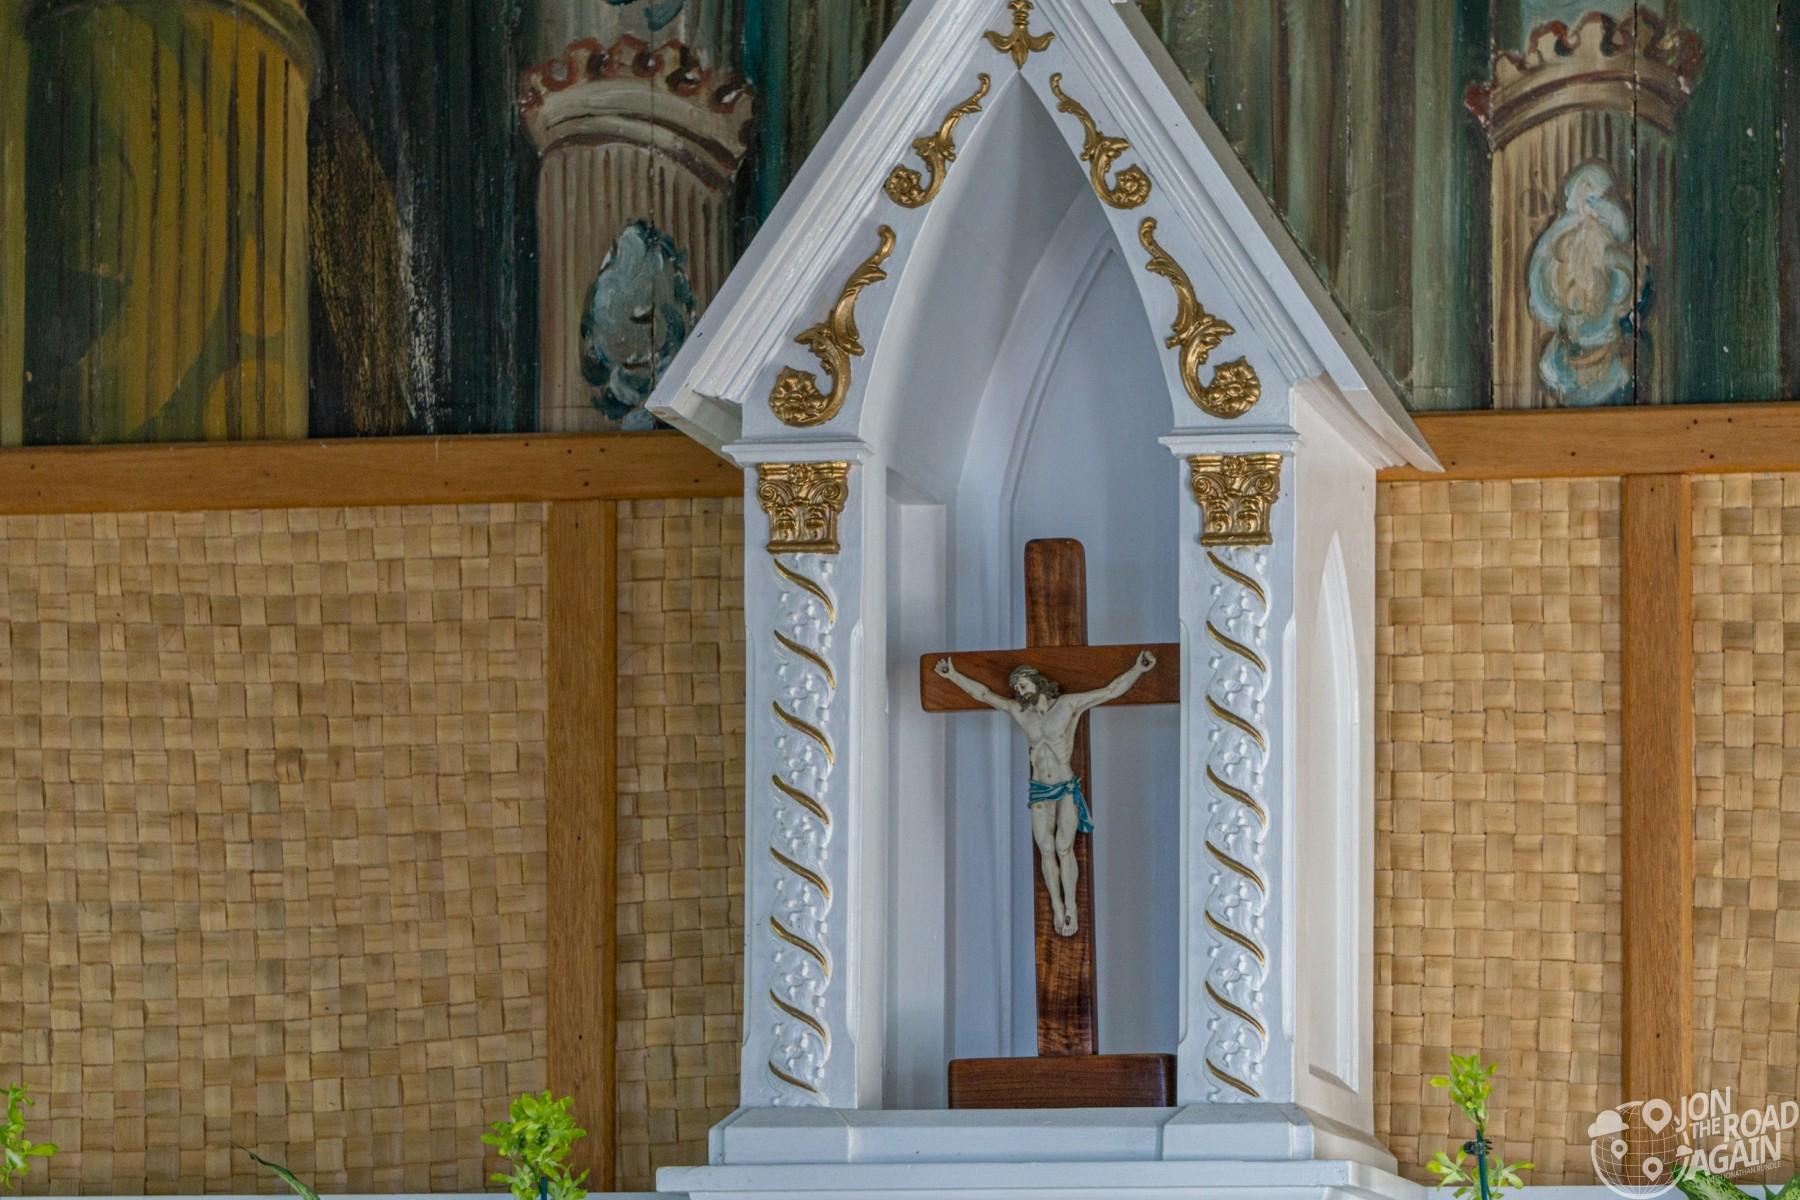 St. Benedict Painted Church Altar